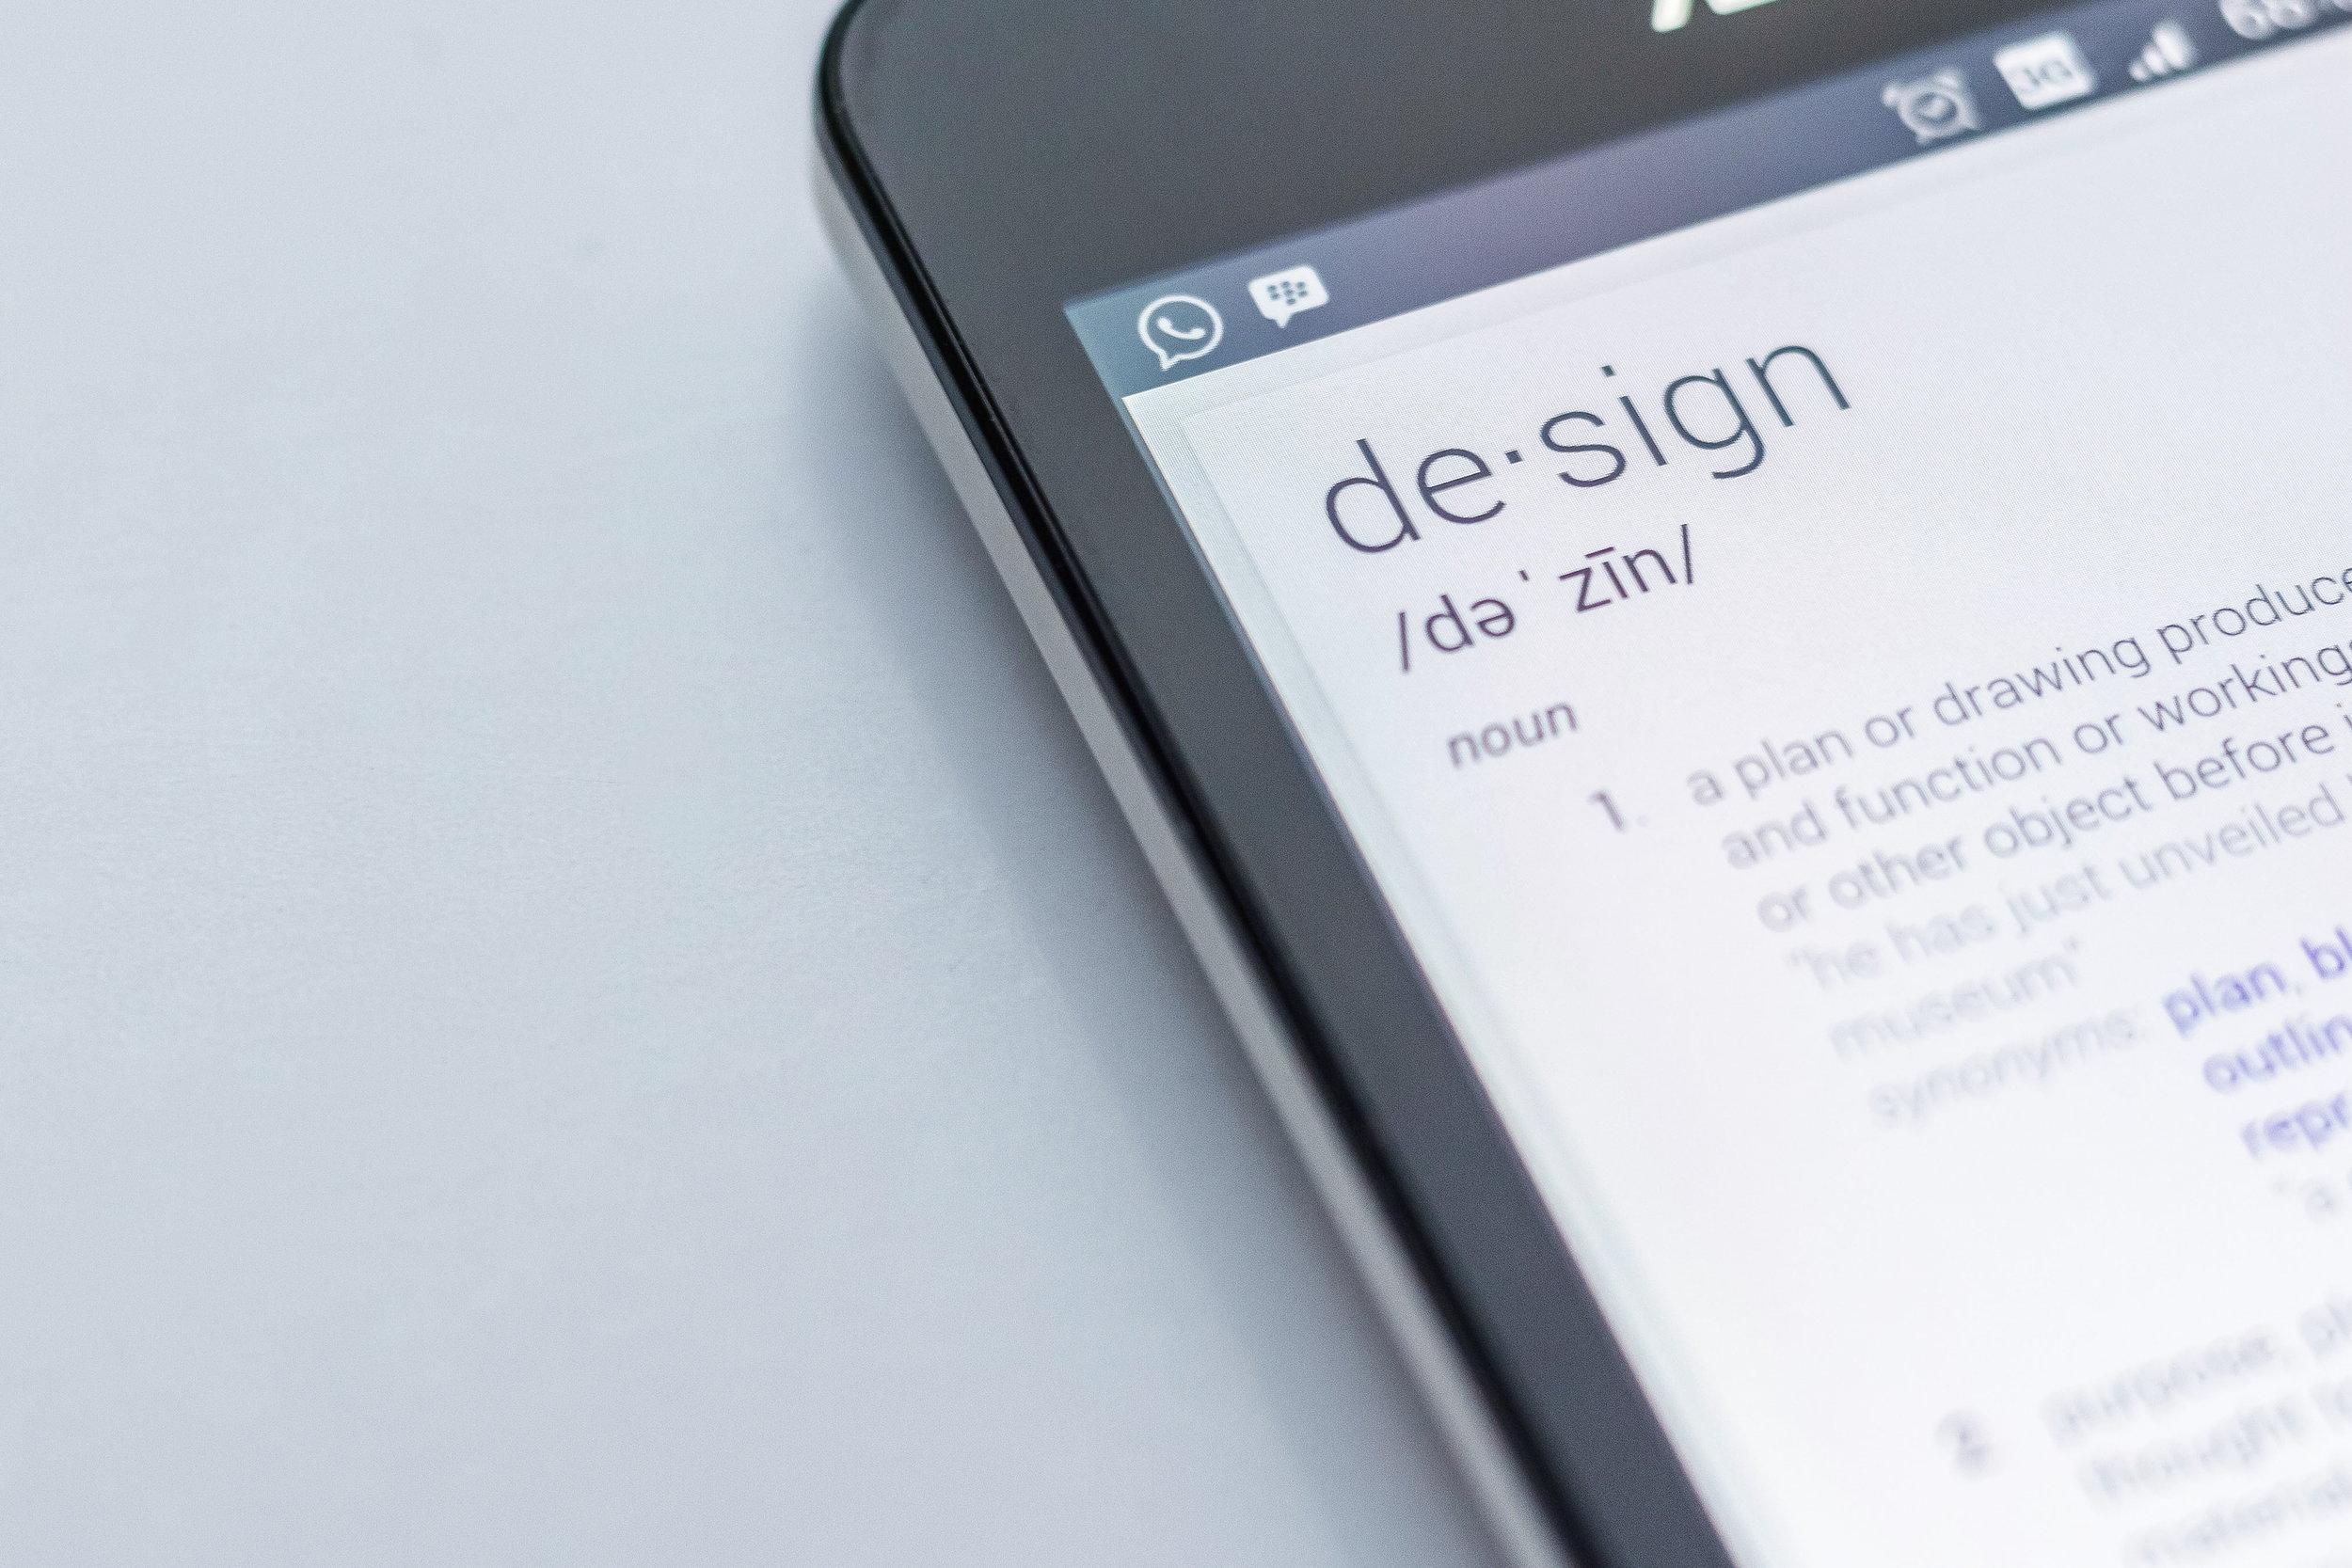 MOBILE & WEB APPLICATIONS - We build smart applications that optimise business processes